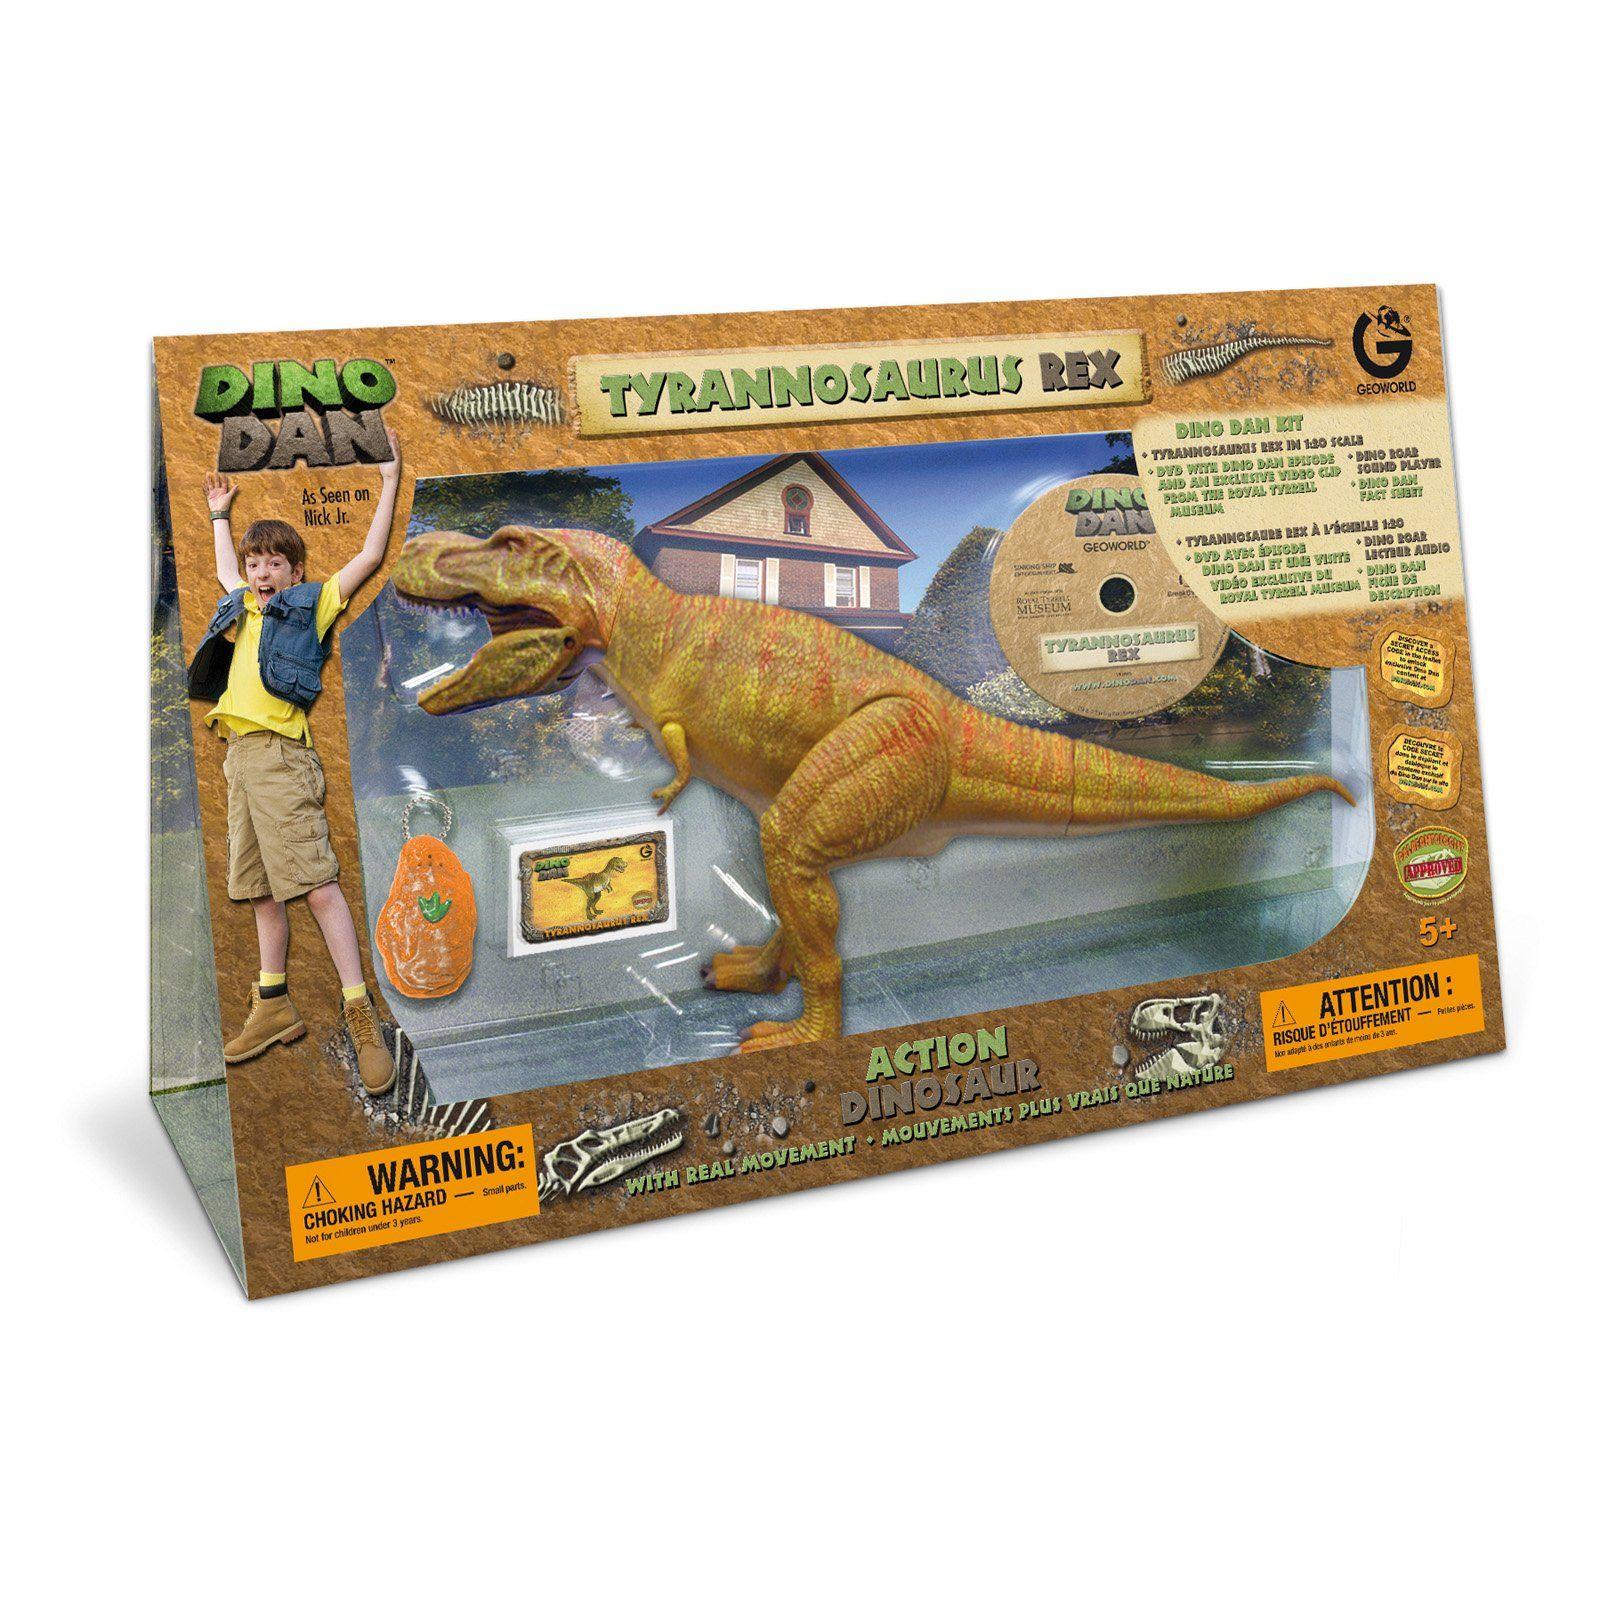 WHOA! Dino Dan Extra Large T-REX Figure | Braxton